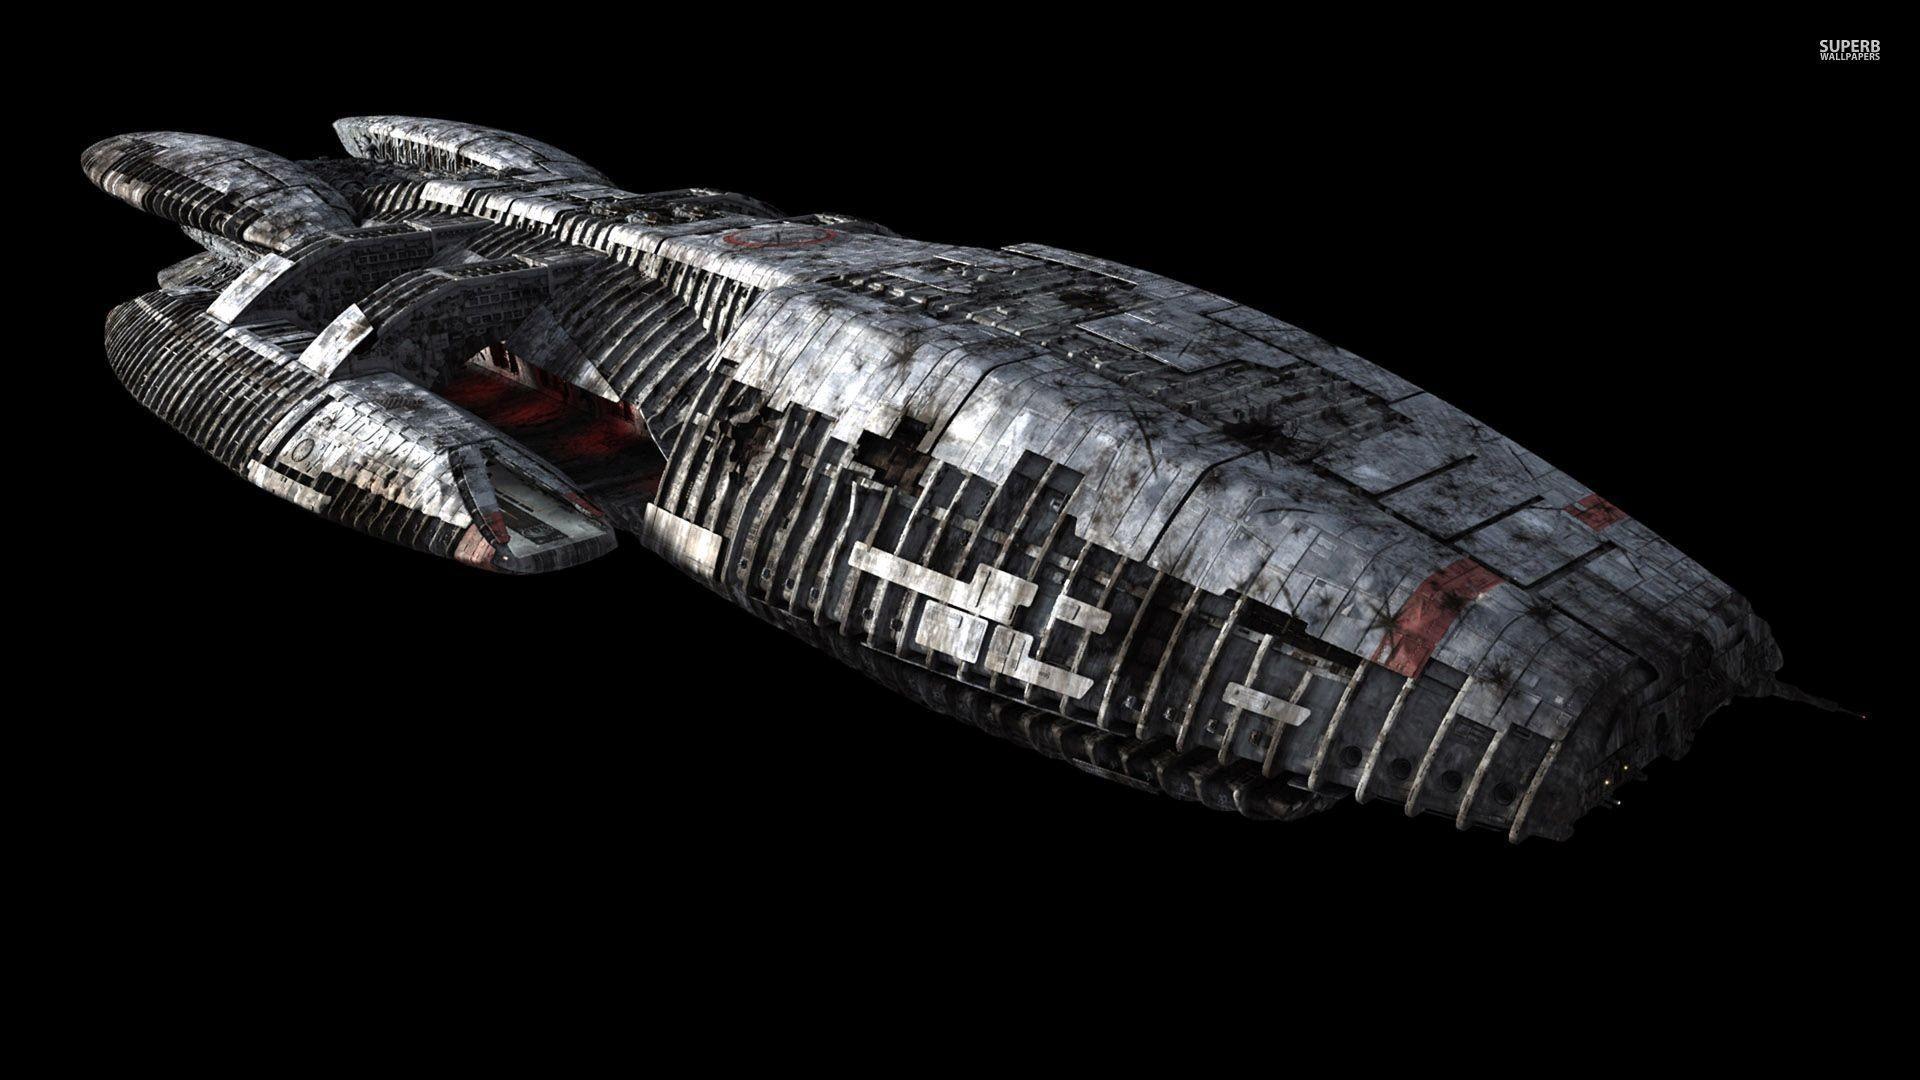 Beautiful screensavers site: Battle galactica screensaver star